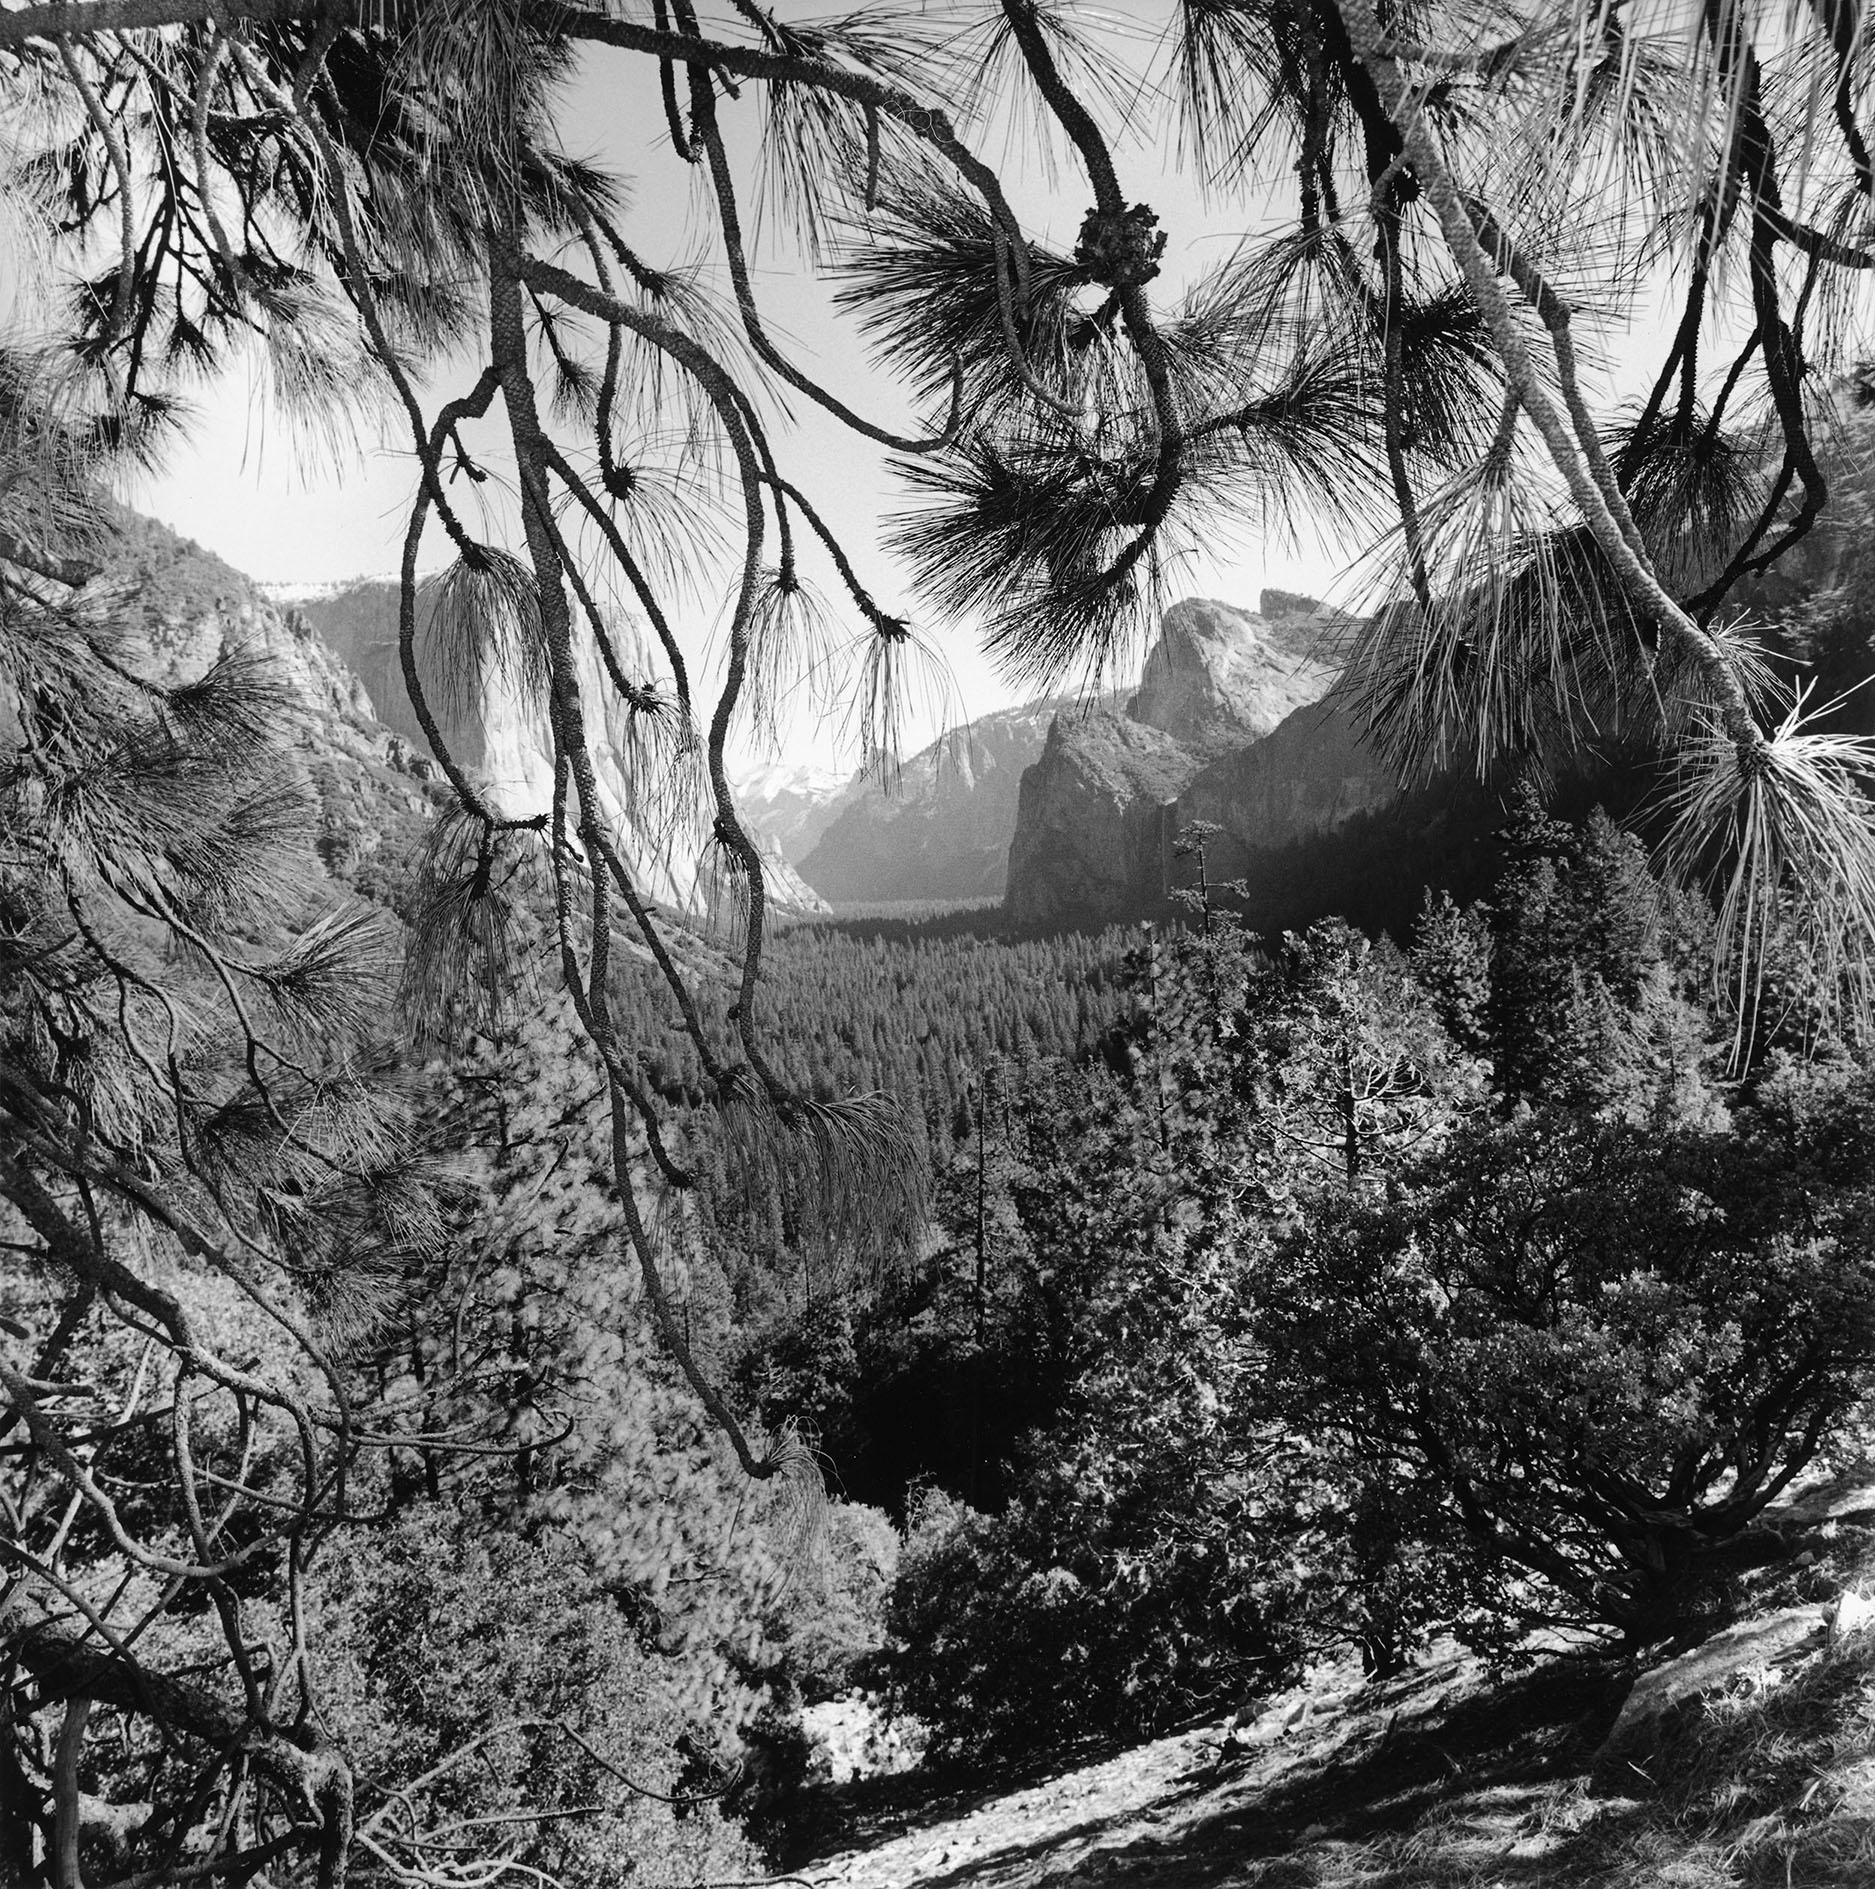 Yosemite National Park, California, 2004. Gelatin silver print. © Lee Friedlander, Courtesy Fraenkel Gallery, San Francisco